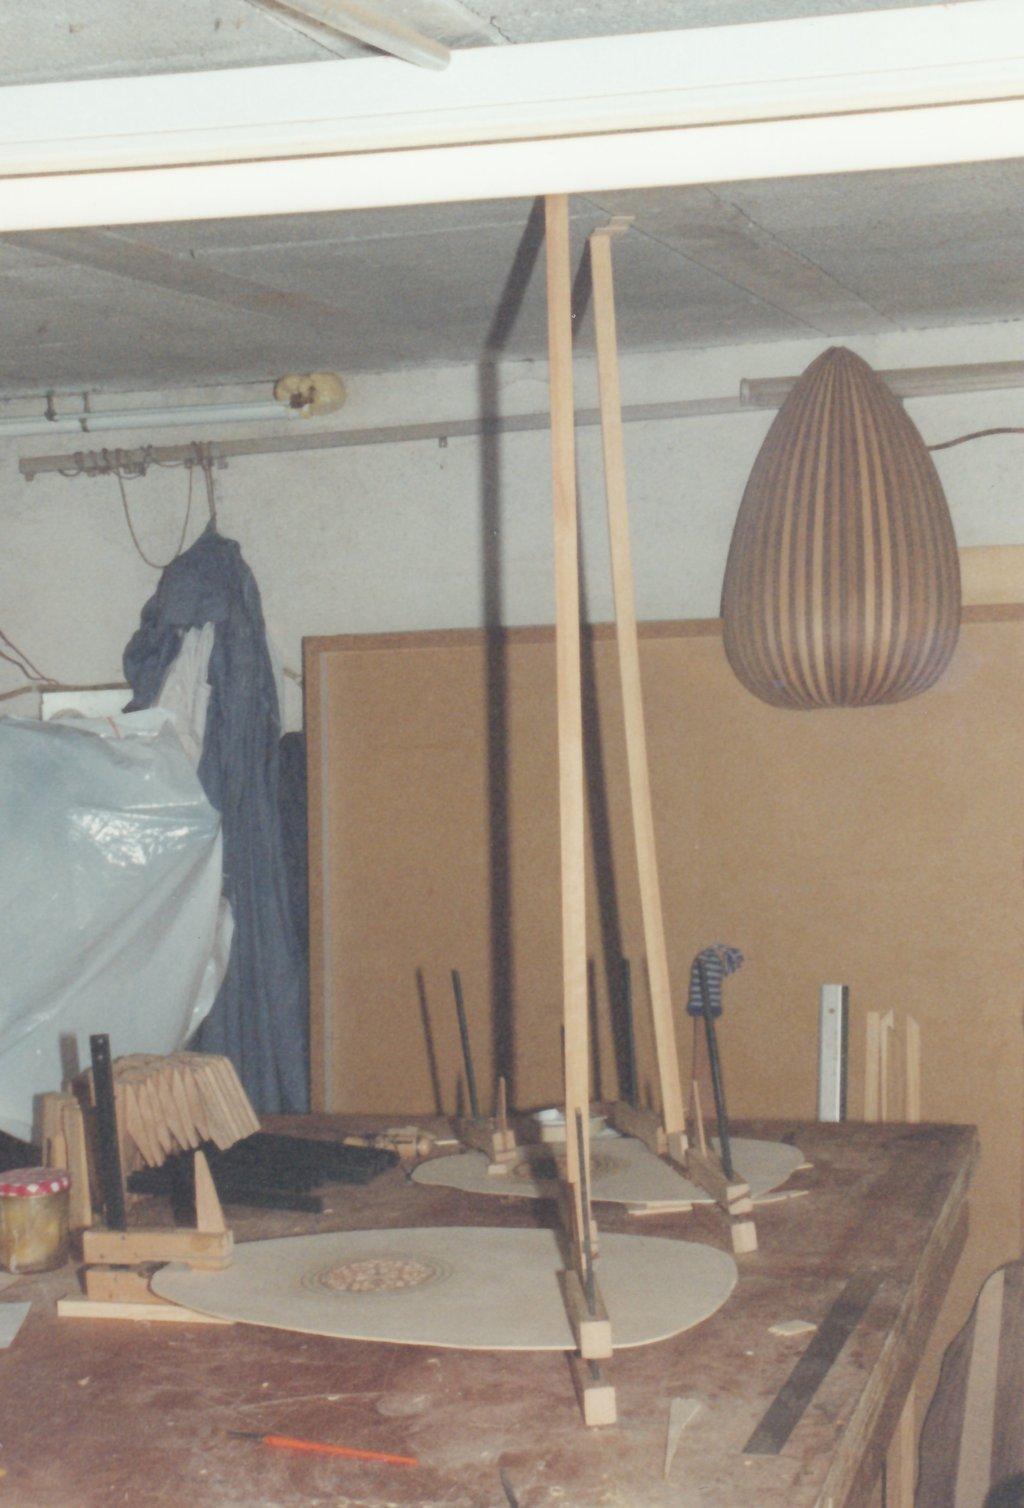 Fabrication d'instruments de musique anciens de bgire - Page 2 5rx6Ib-1994-Bandora-15